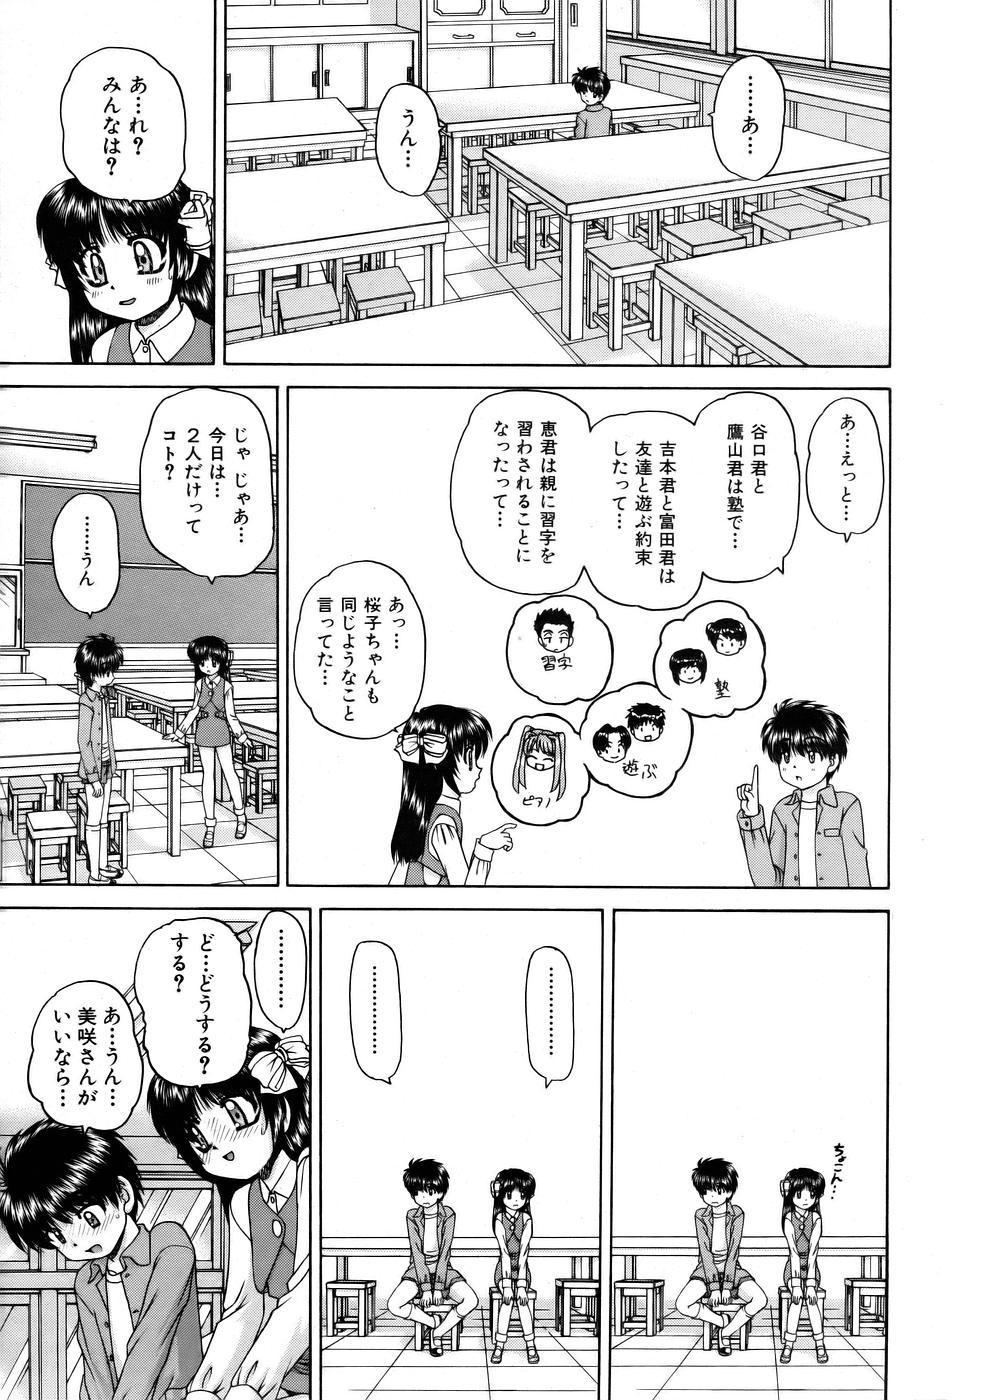 COMIC AUN 2005-10 Vol. 113 284